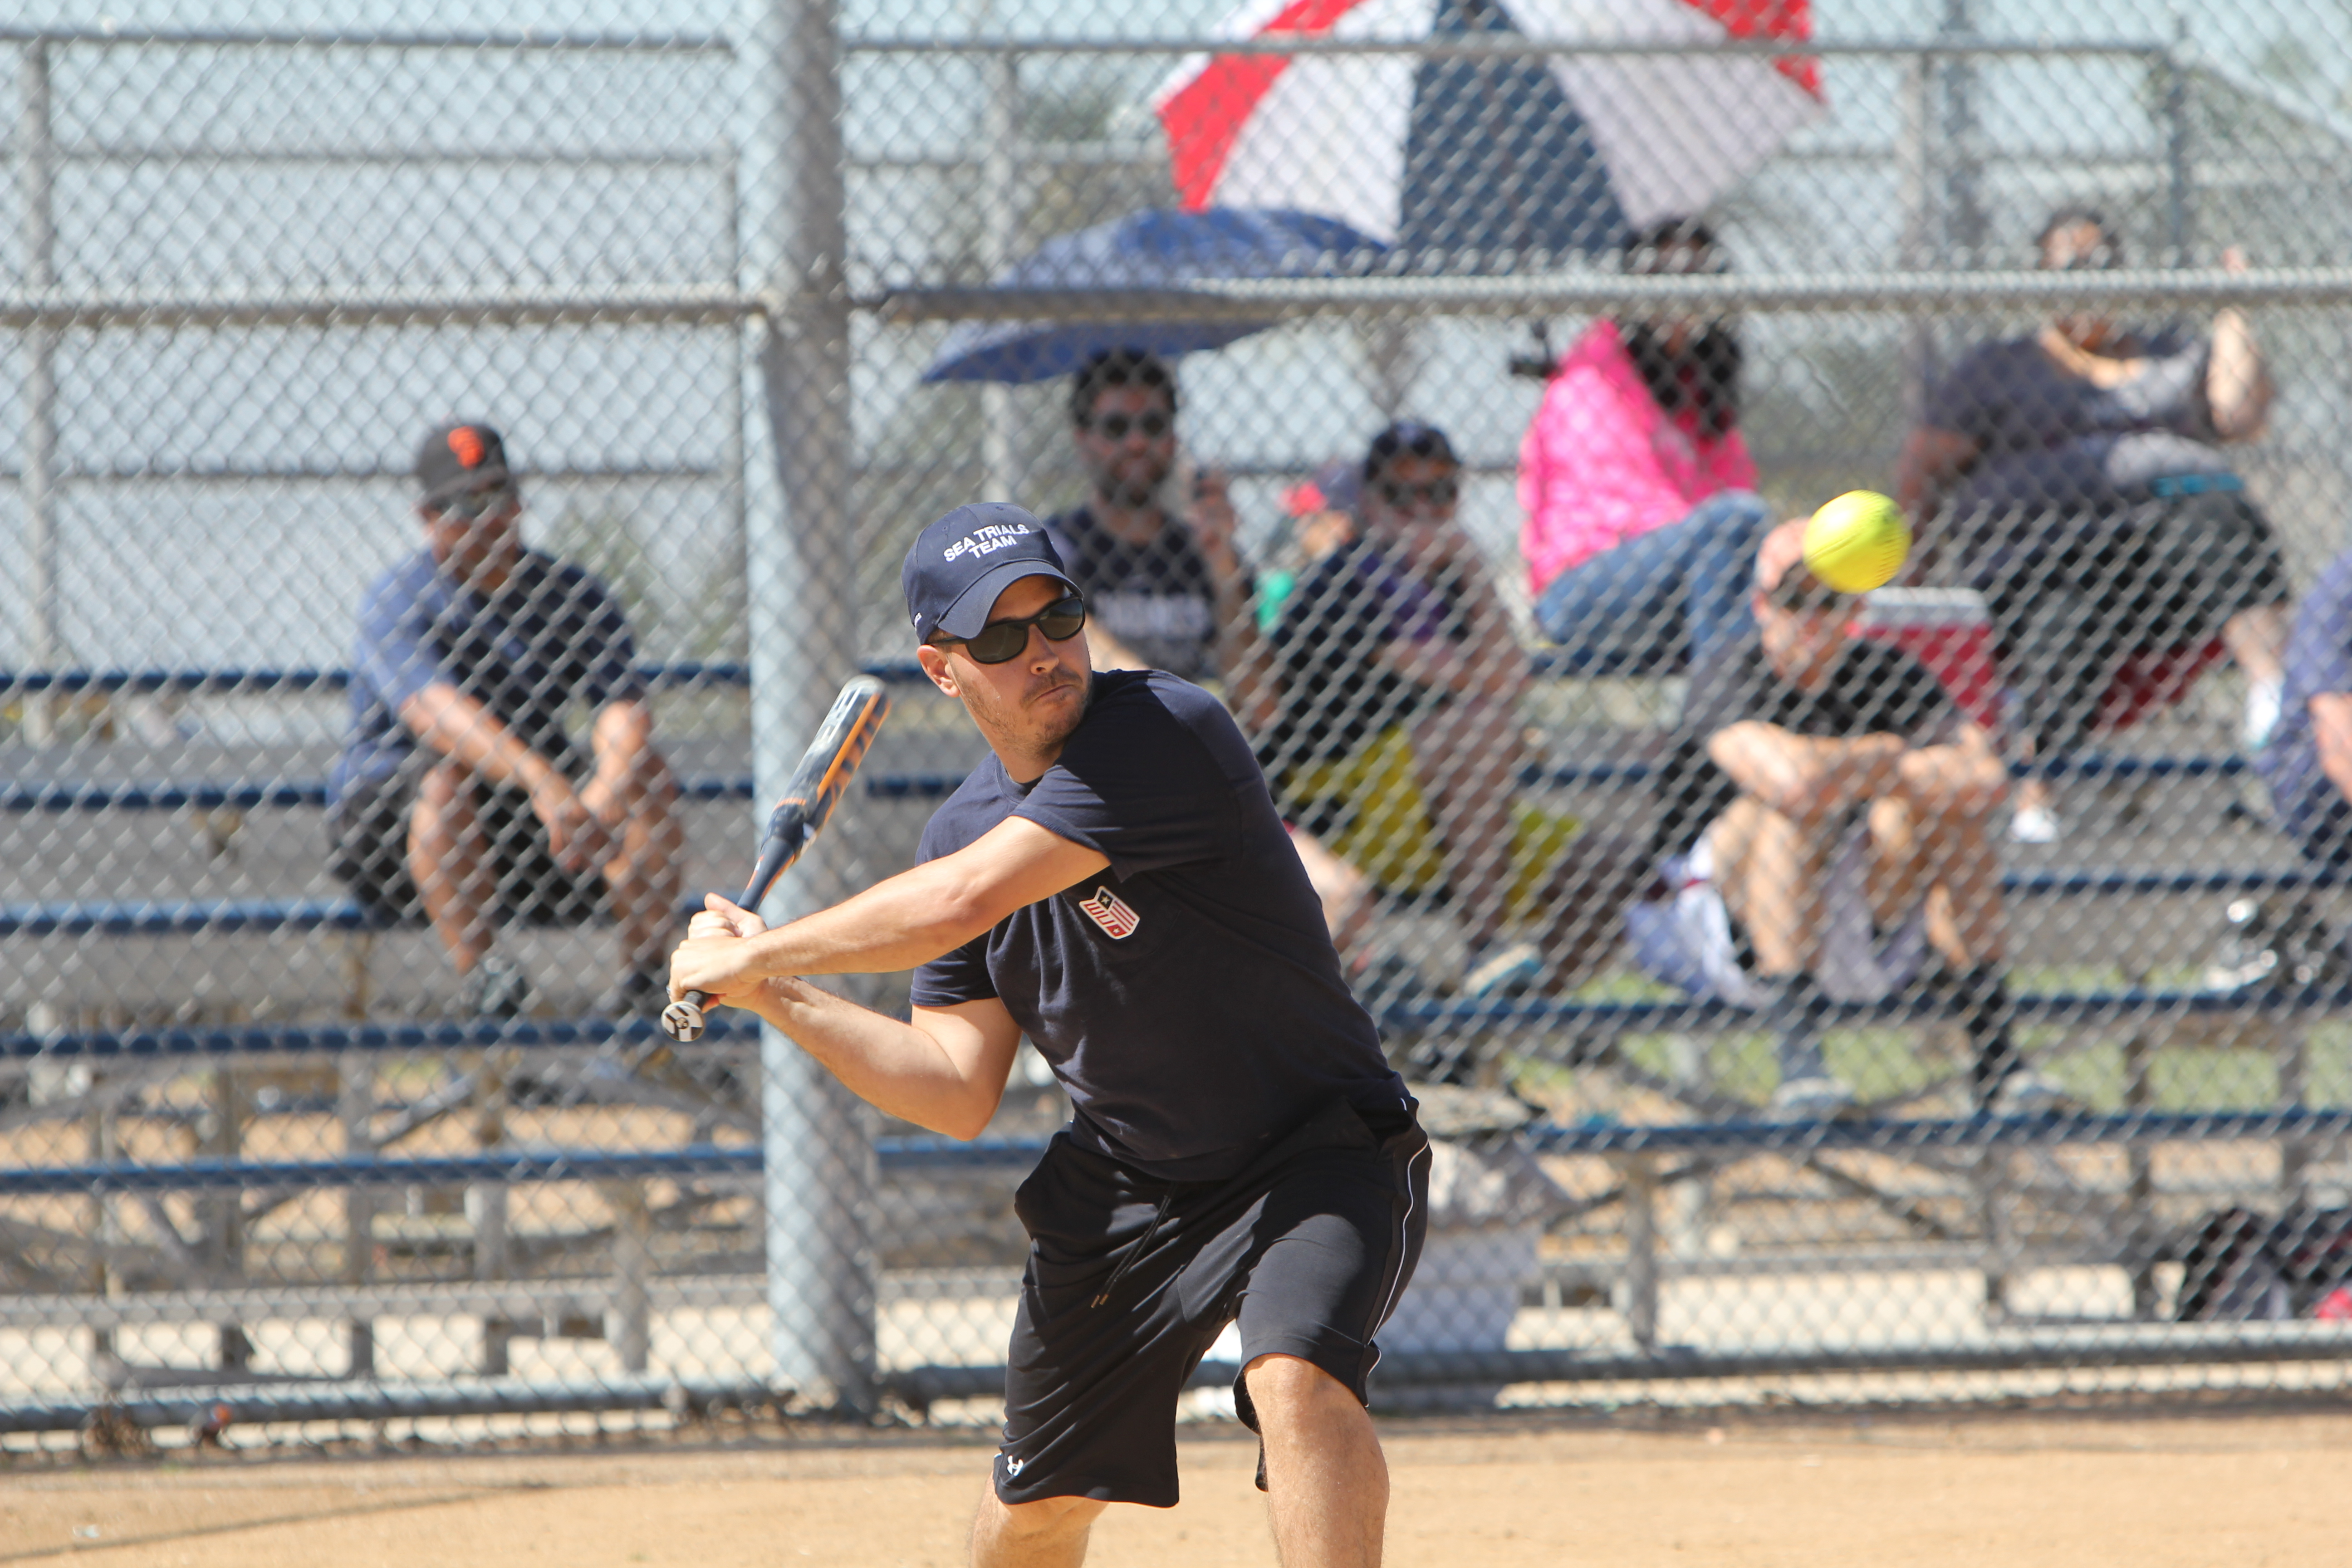 03-11-17 SIGNs Softball (3)